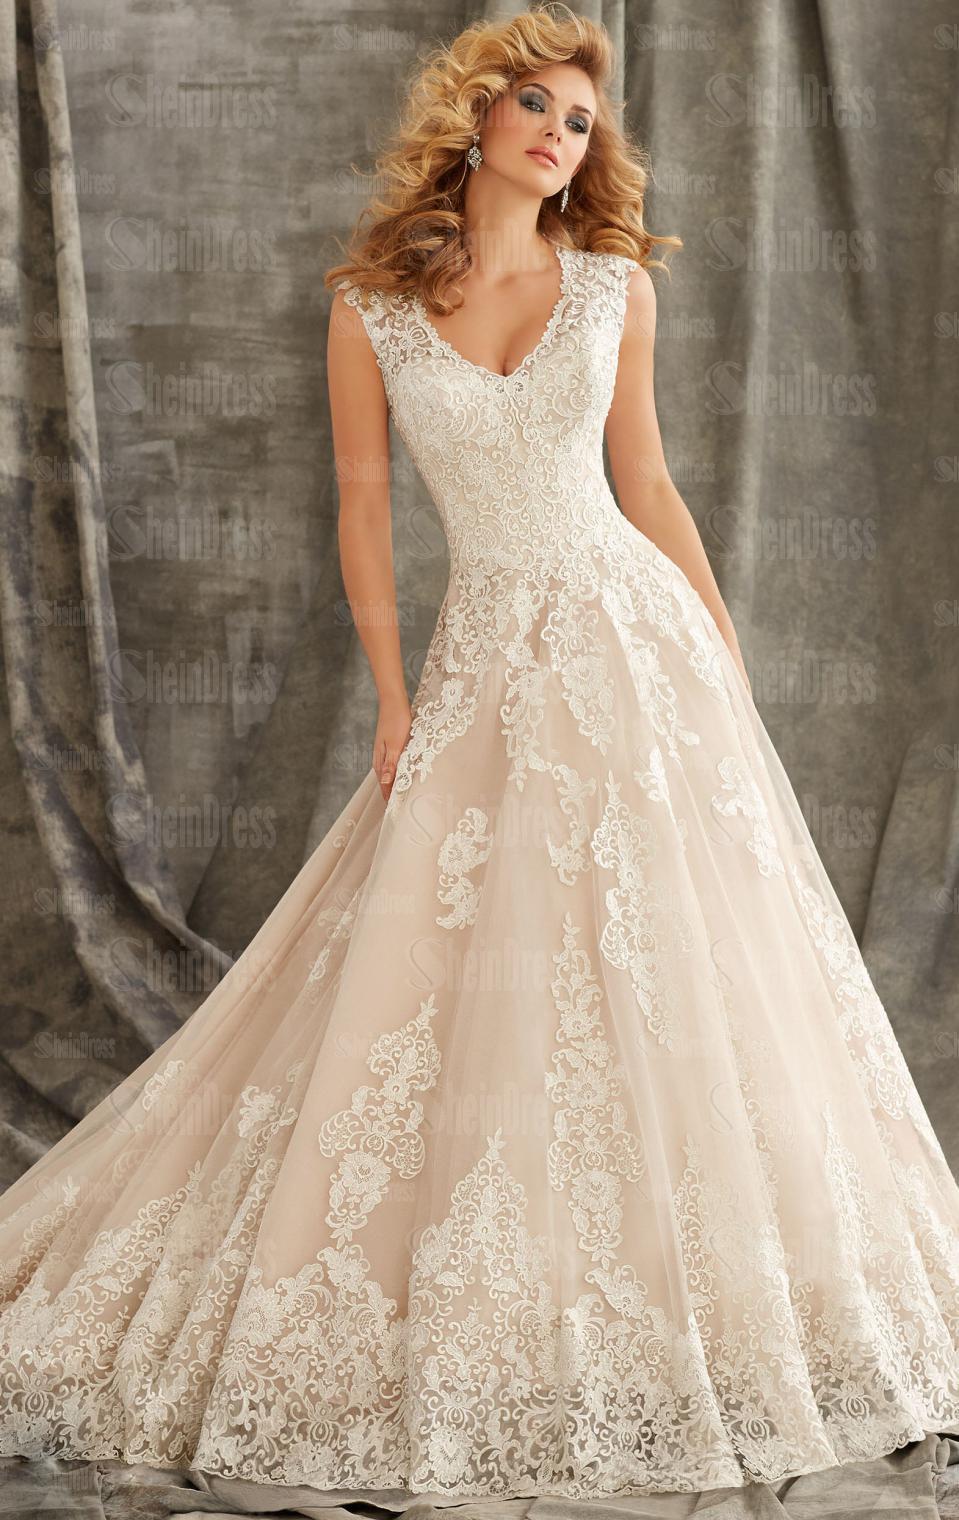 lace princess wedding dresses photo - 1